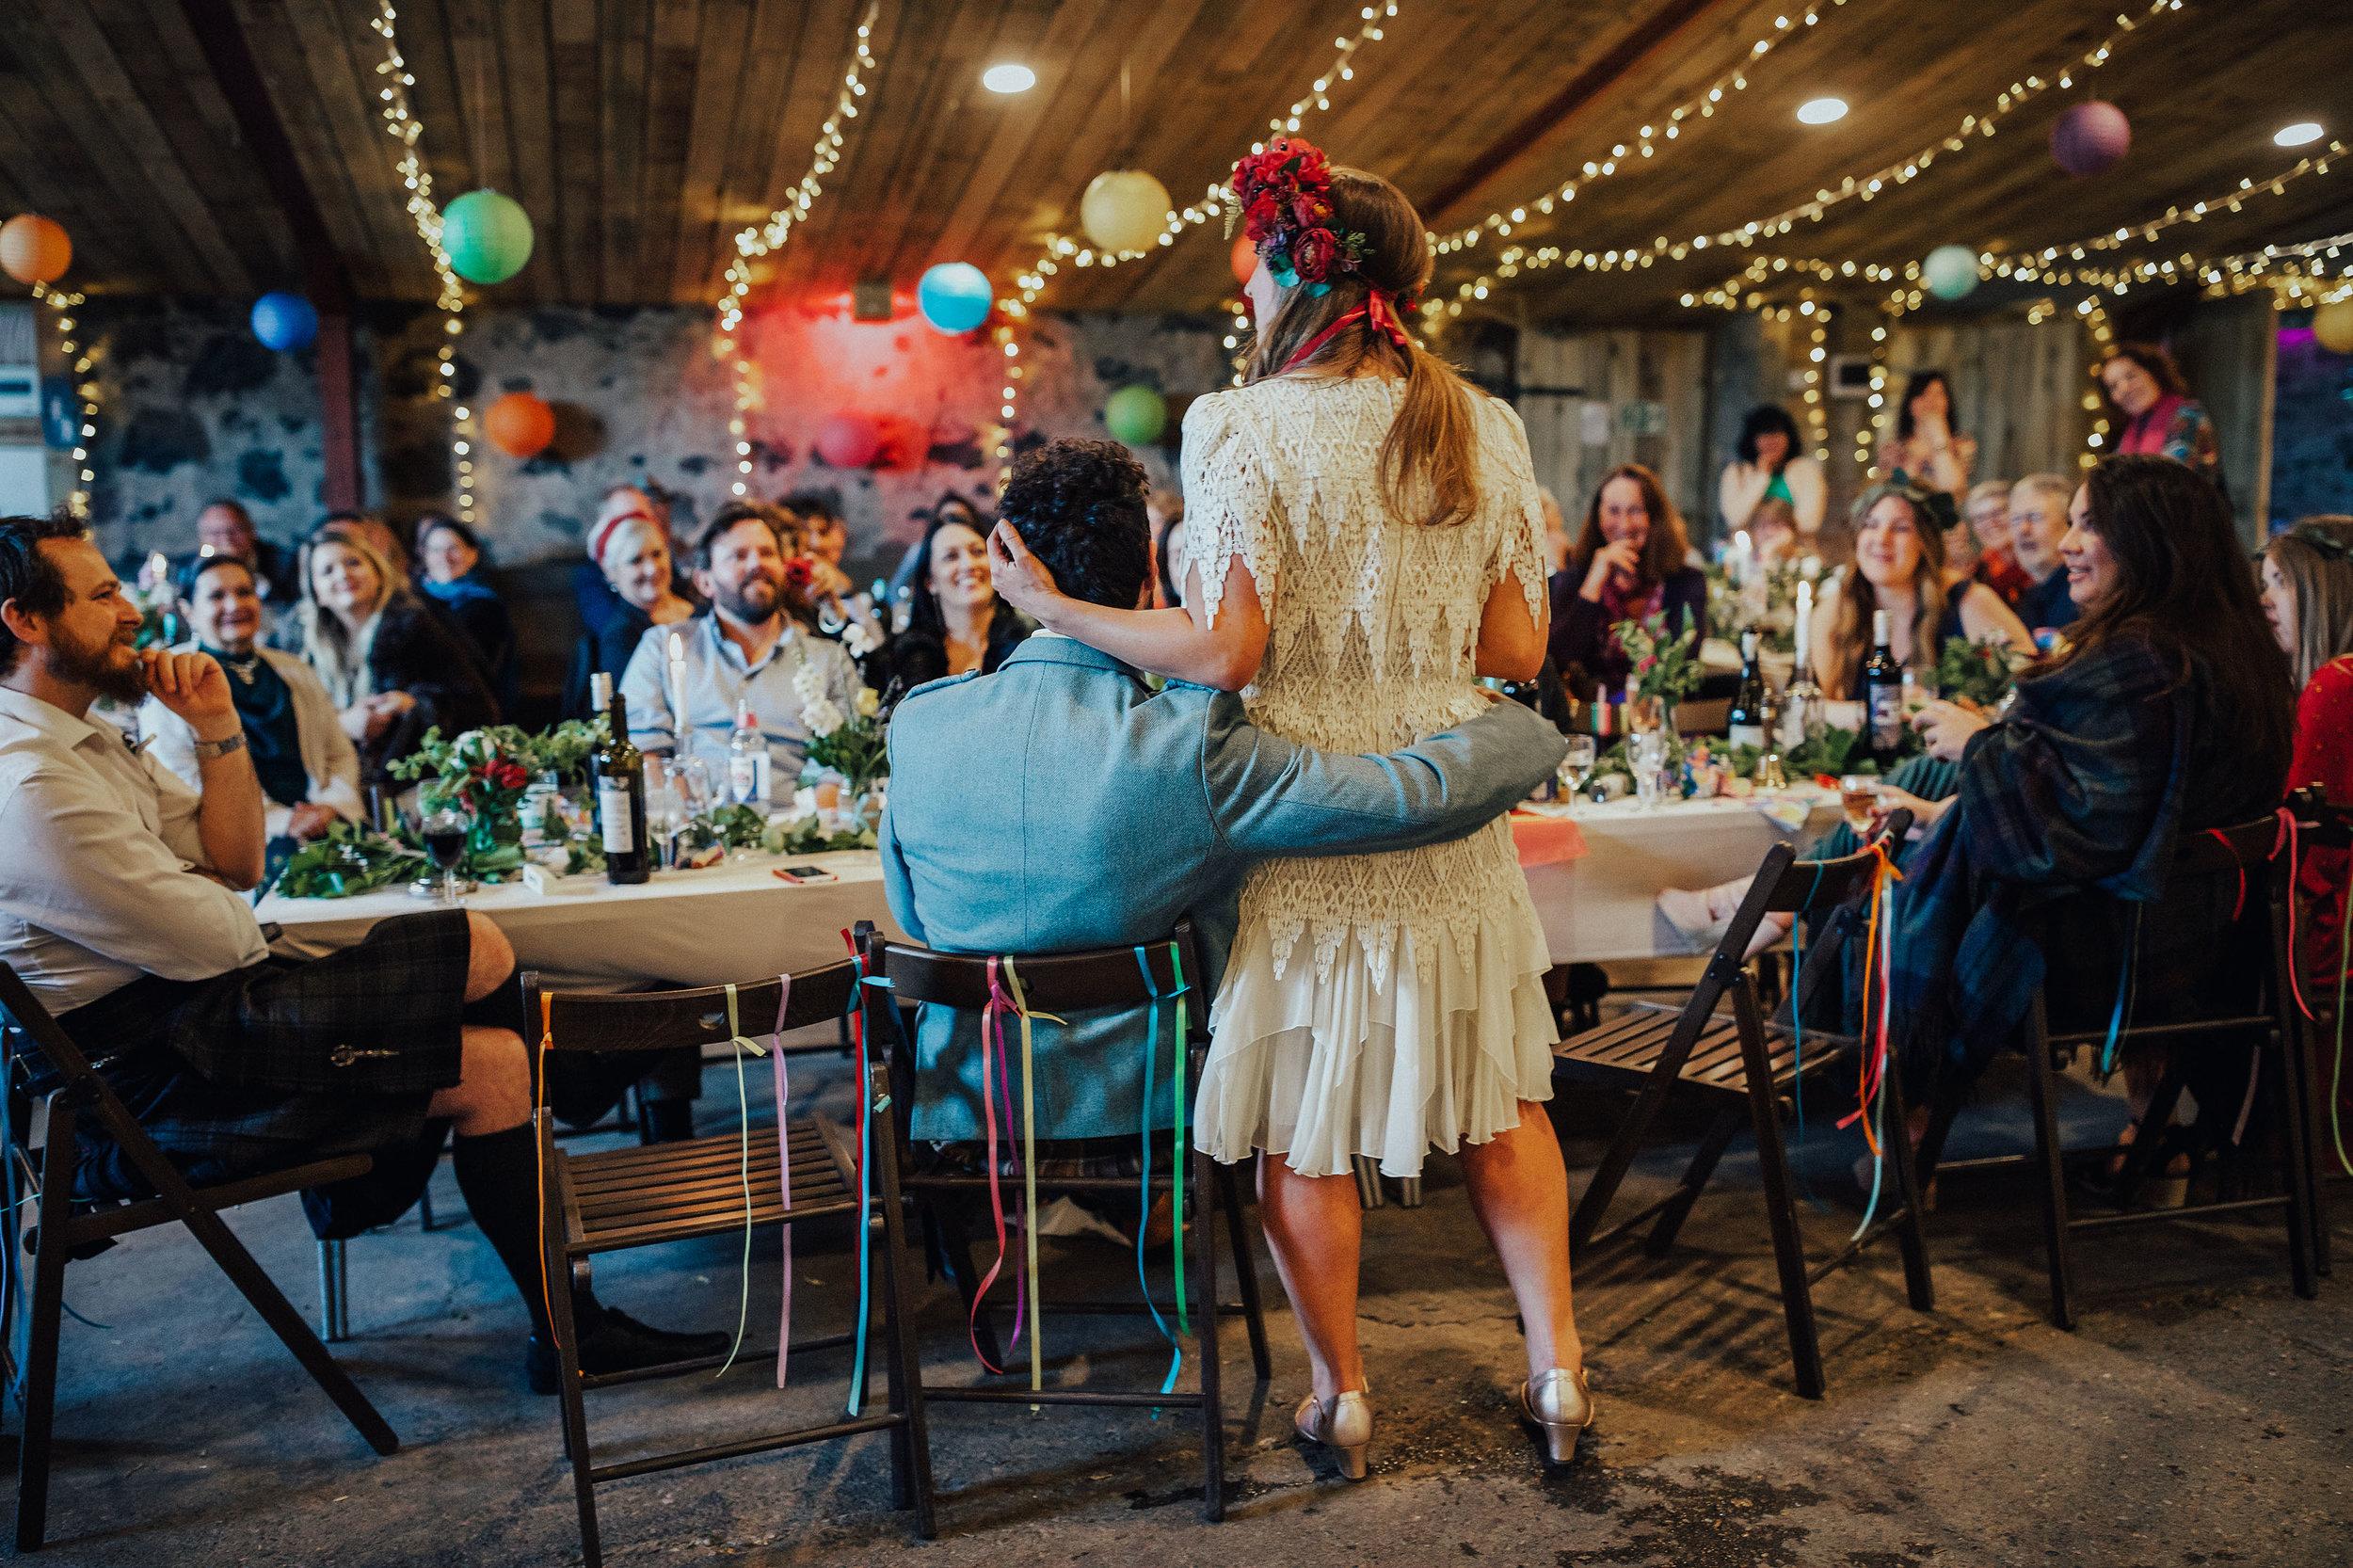 COMRIE_CROFT_WEDDINGS_PJ_PHILLIPS_PHOTOGRAPHY_163.jpg